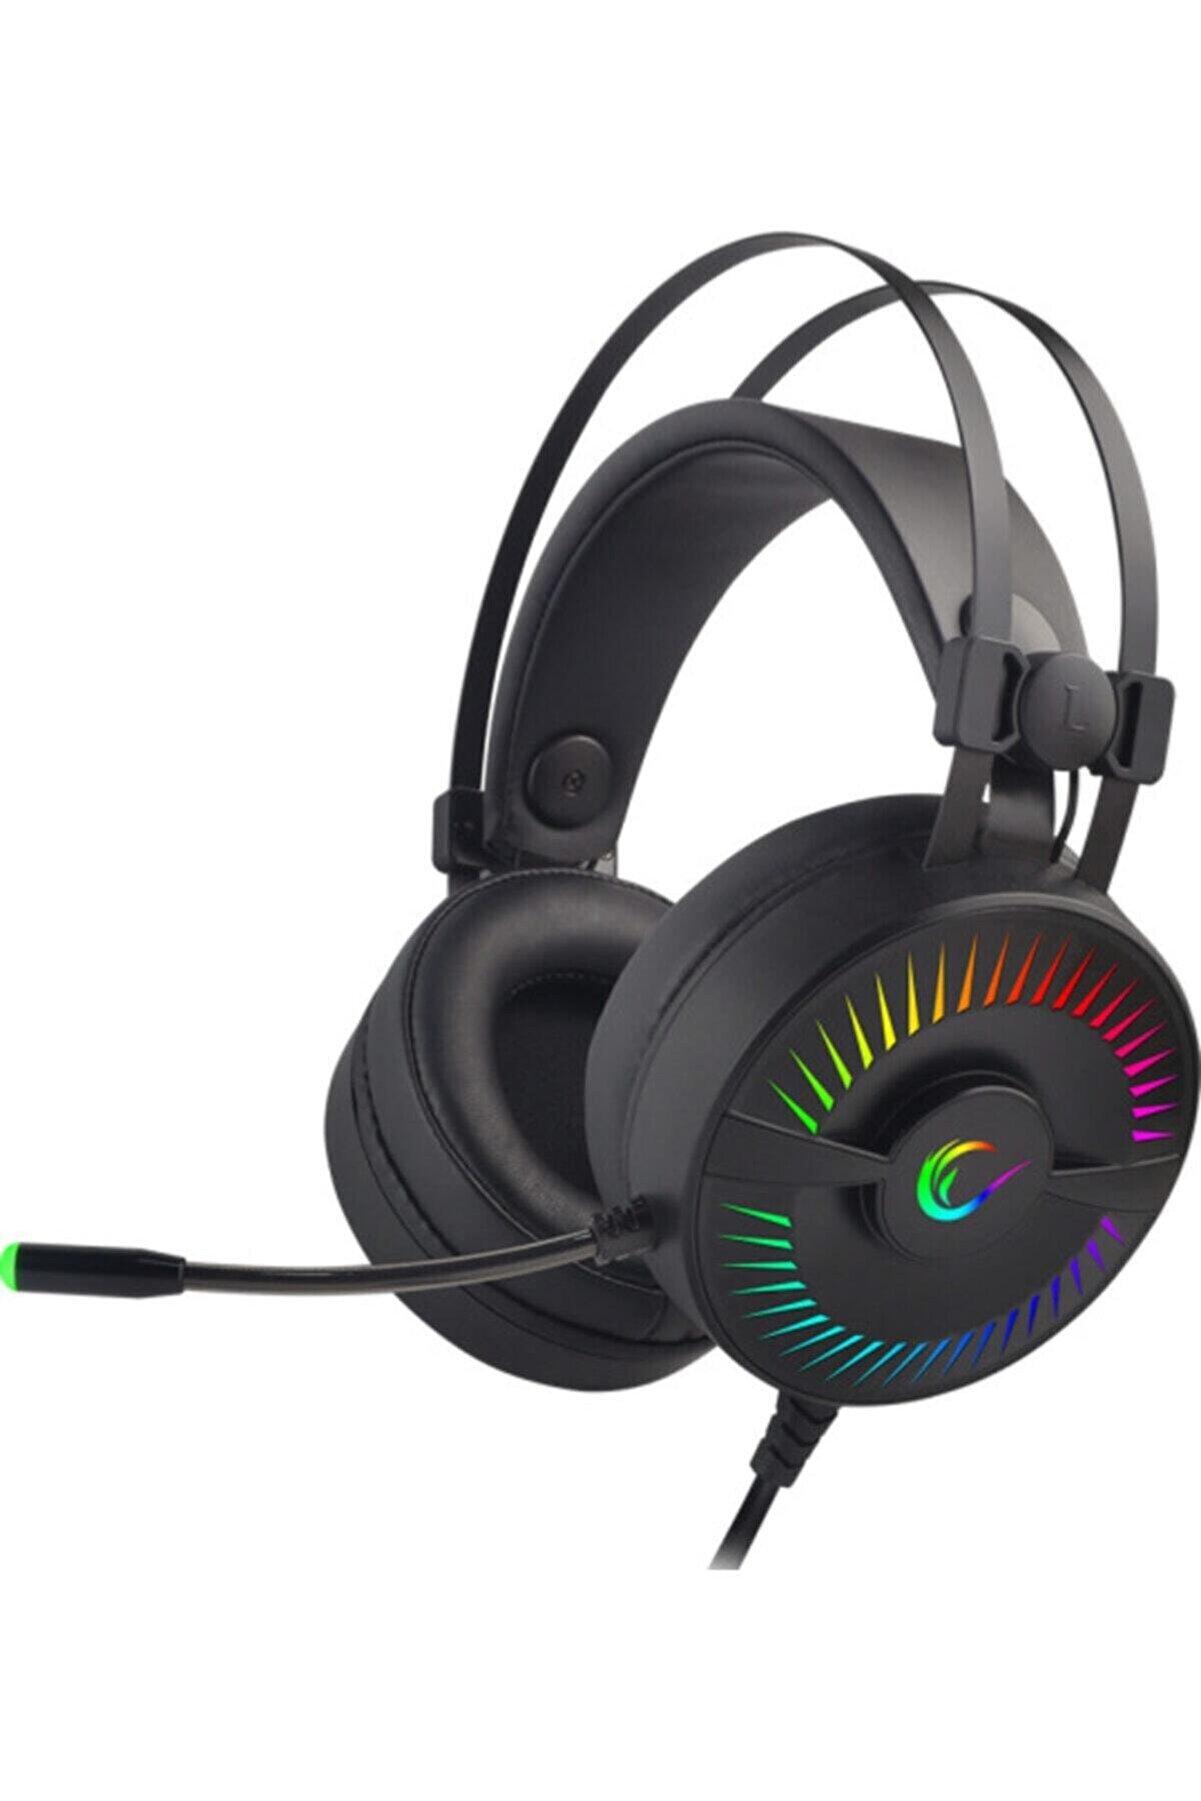 Rampage Rm-2019g X-tıtan Rgb 7.1 Surround Usb Mikrofonlu Oyuncu Kulaklığı Profesyonel Kulaklık